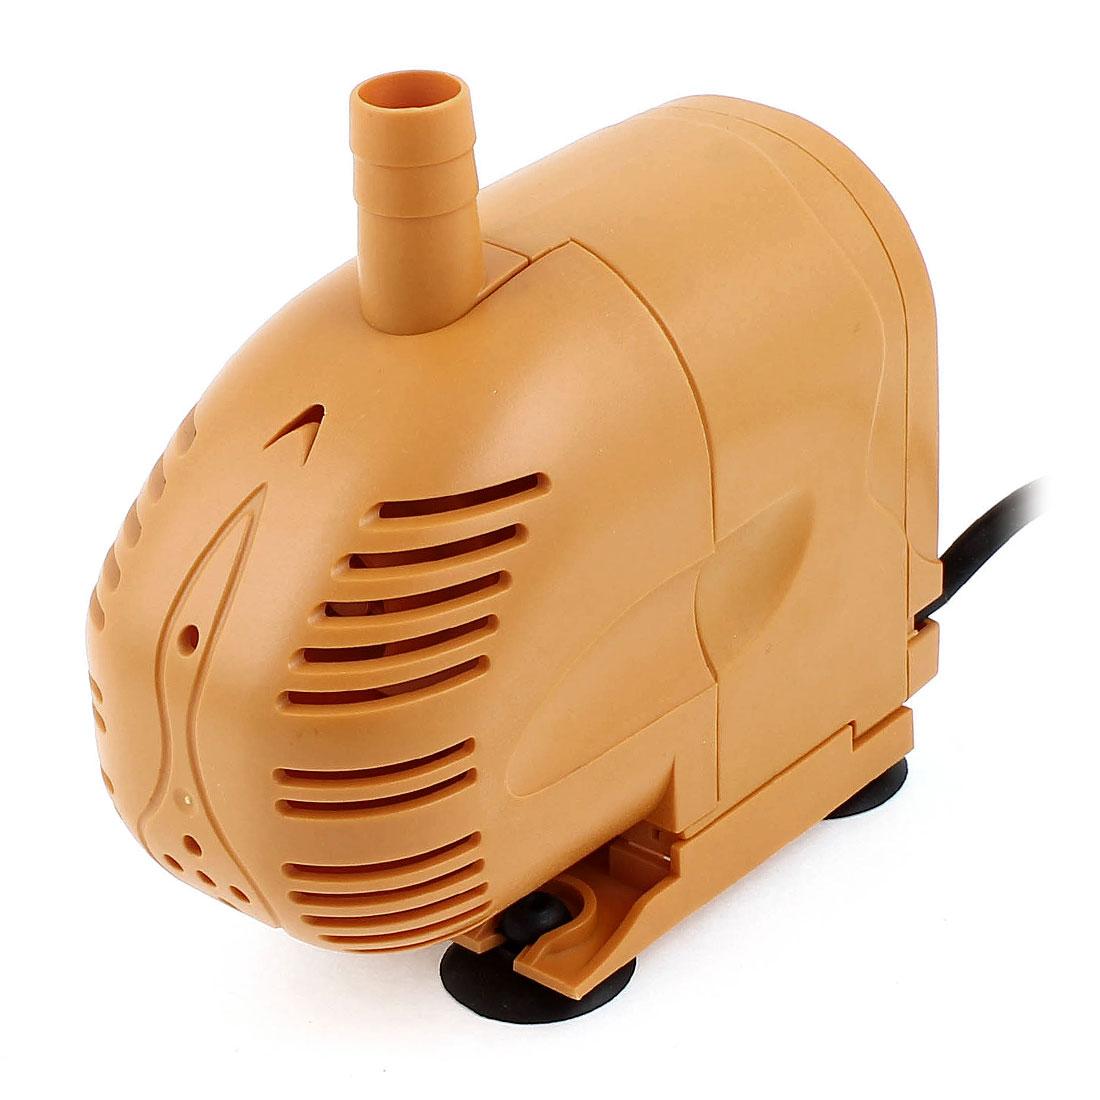 AC 220-240V UK Plug 25W 1500L/H Flowrate Fish Tank Submersible Pump